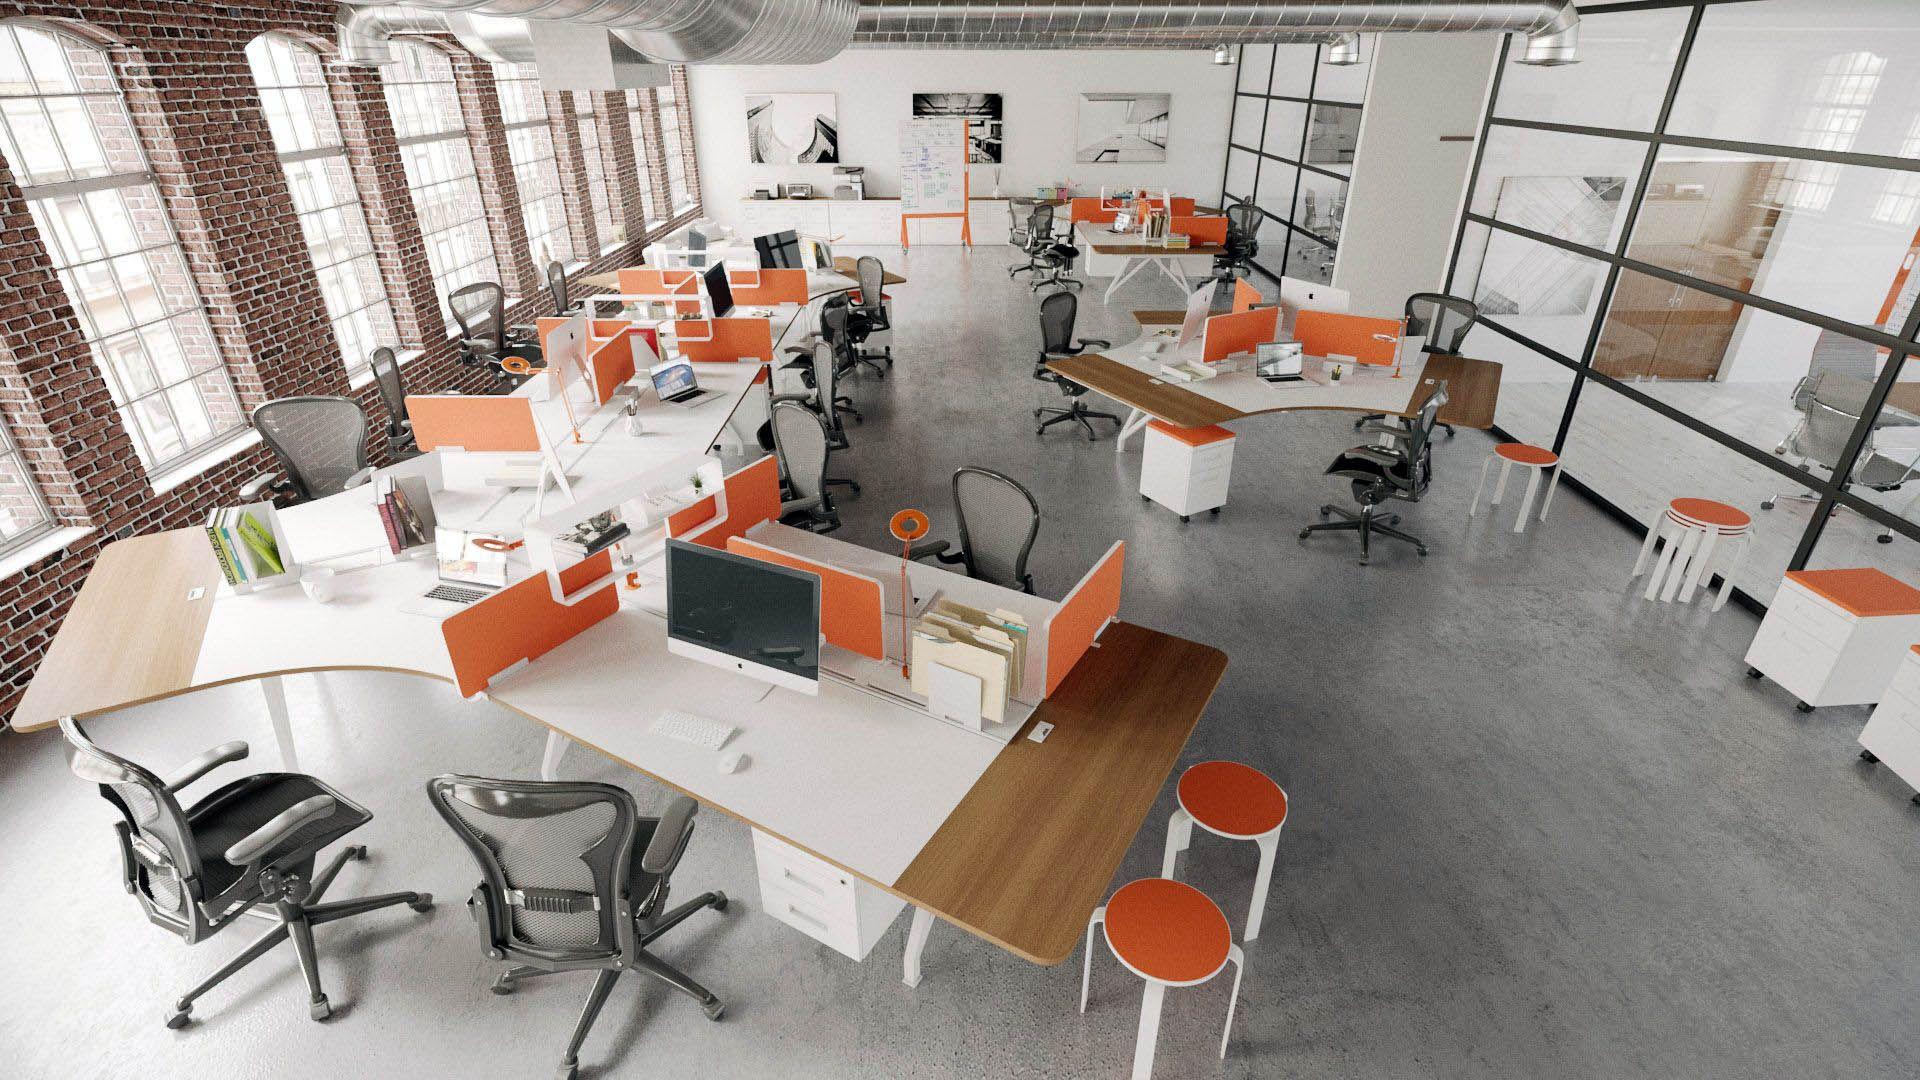 Ideas For Creative Desks Desks For Small Spaces Corporate